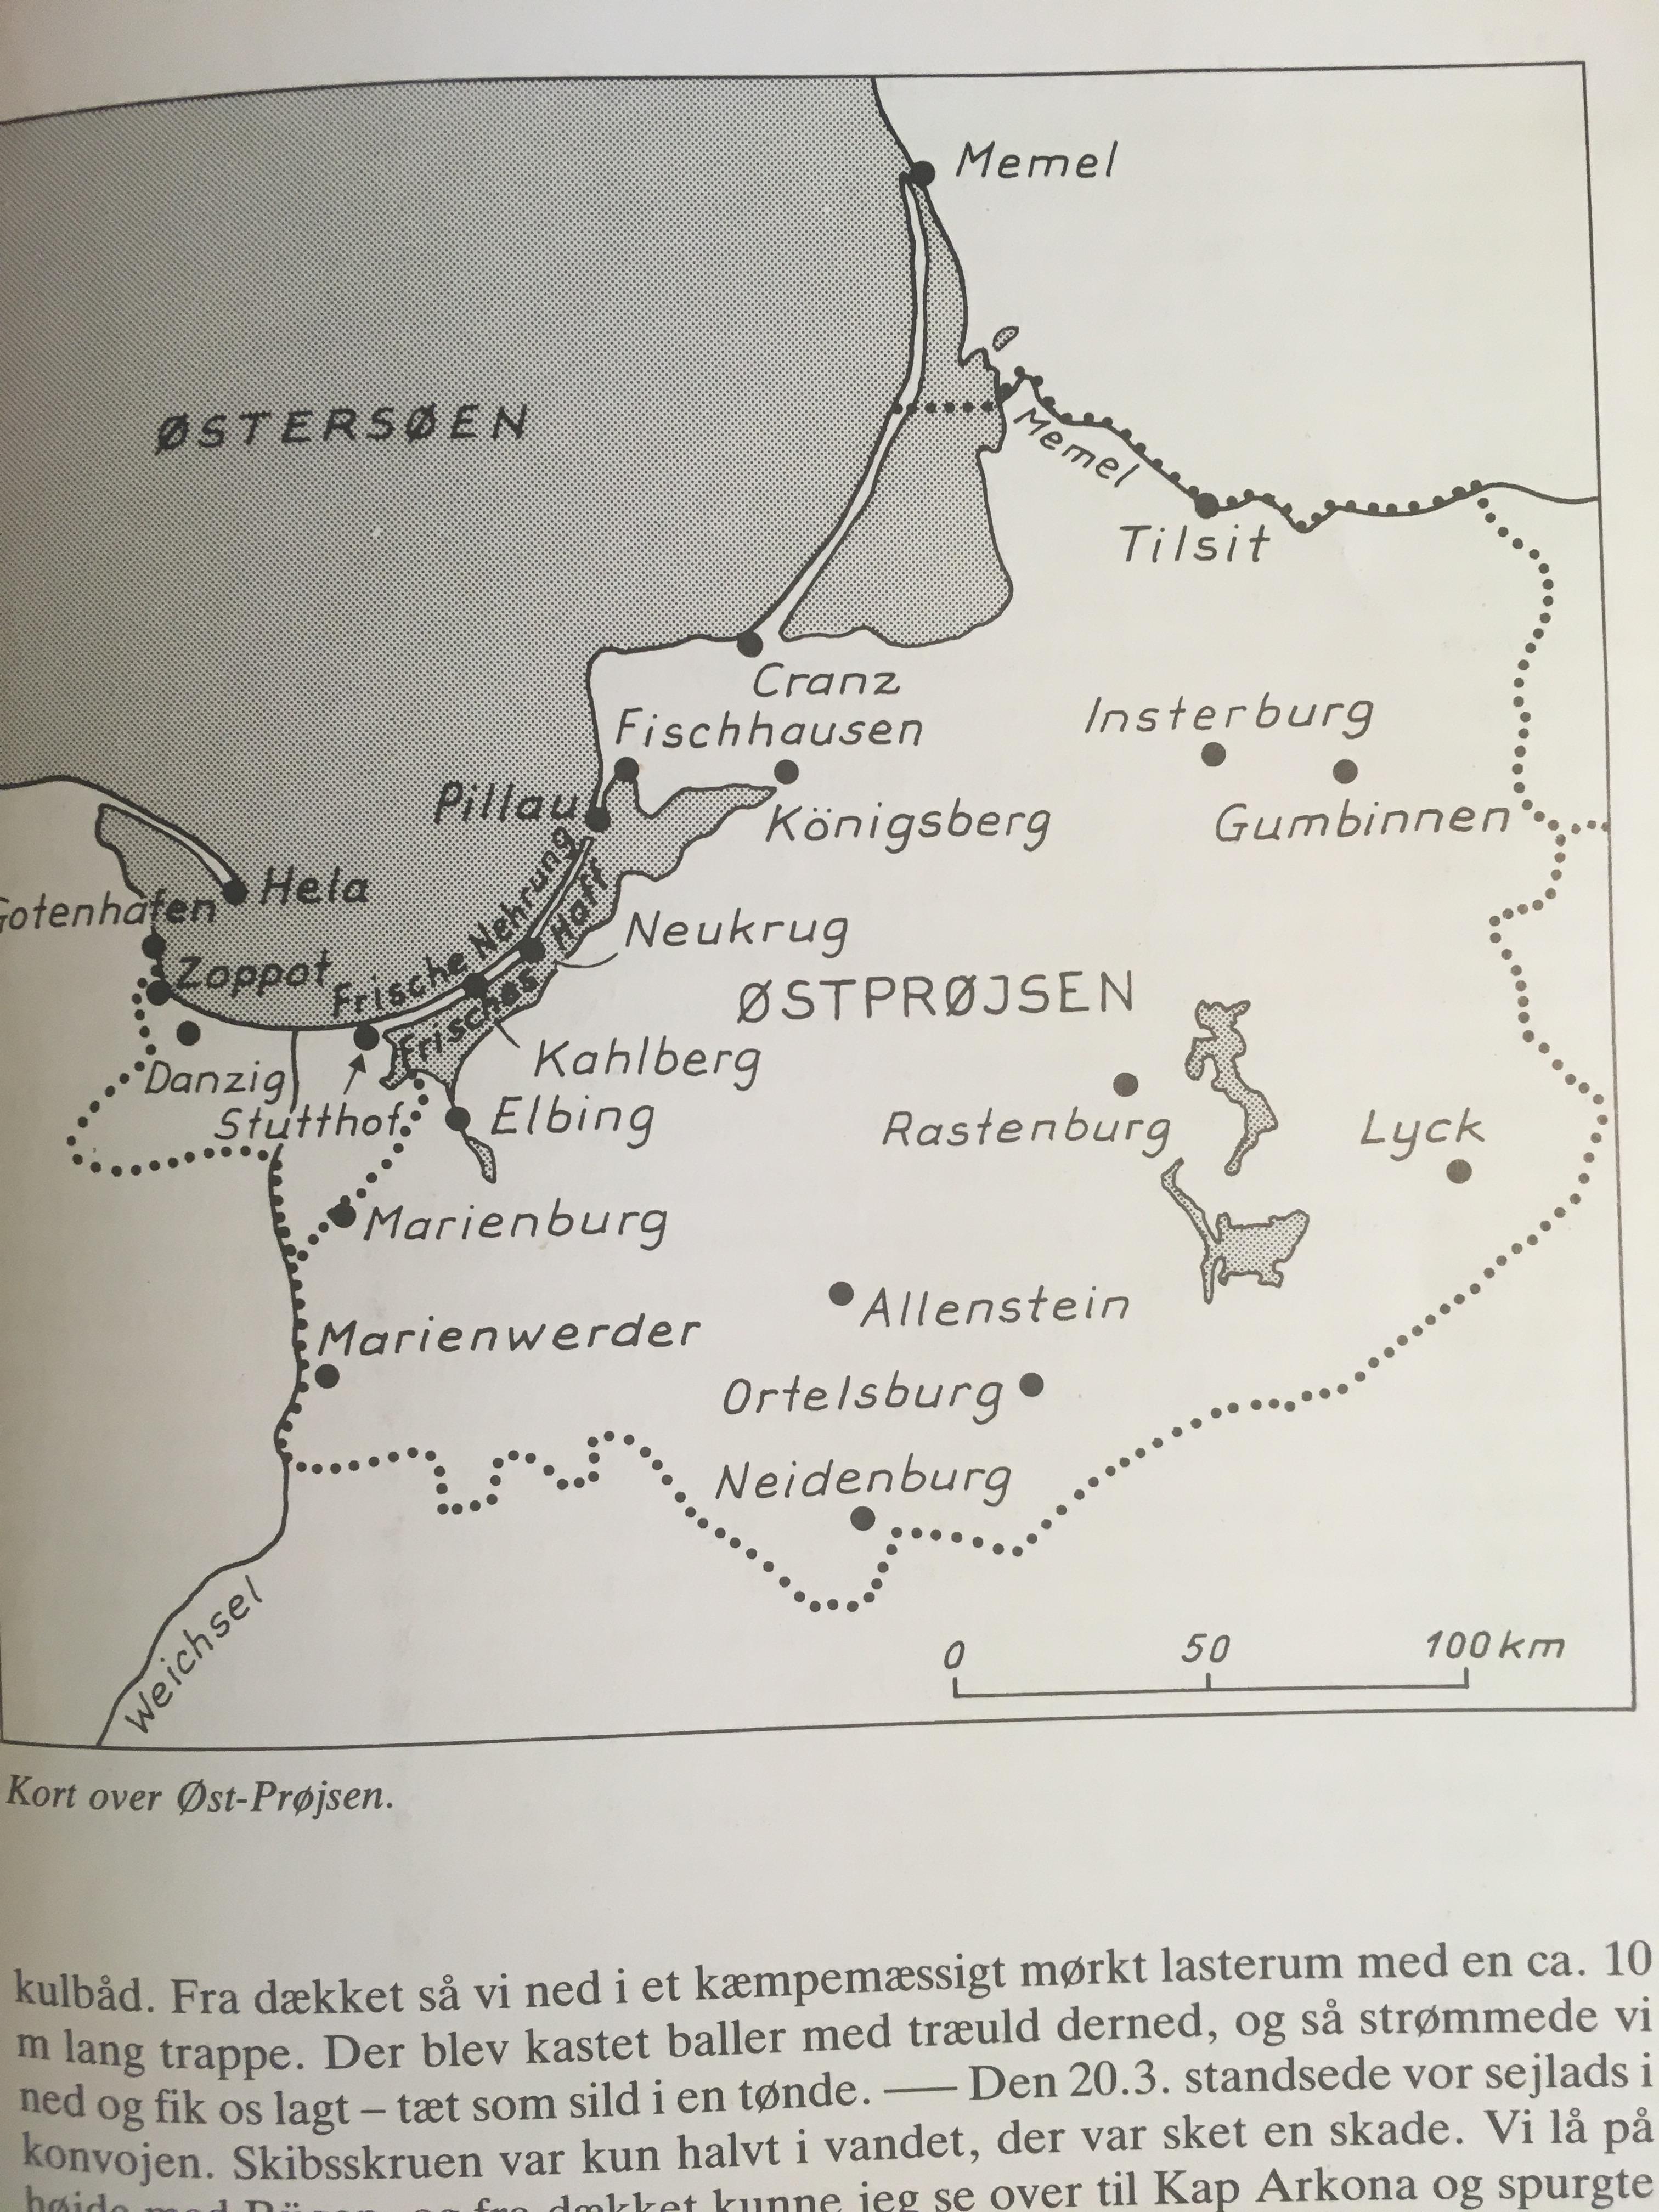 De Tyske Flygtninge I Dk Ostpreussen From One Heart To Another